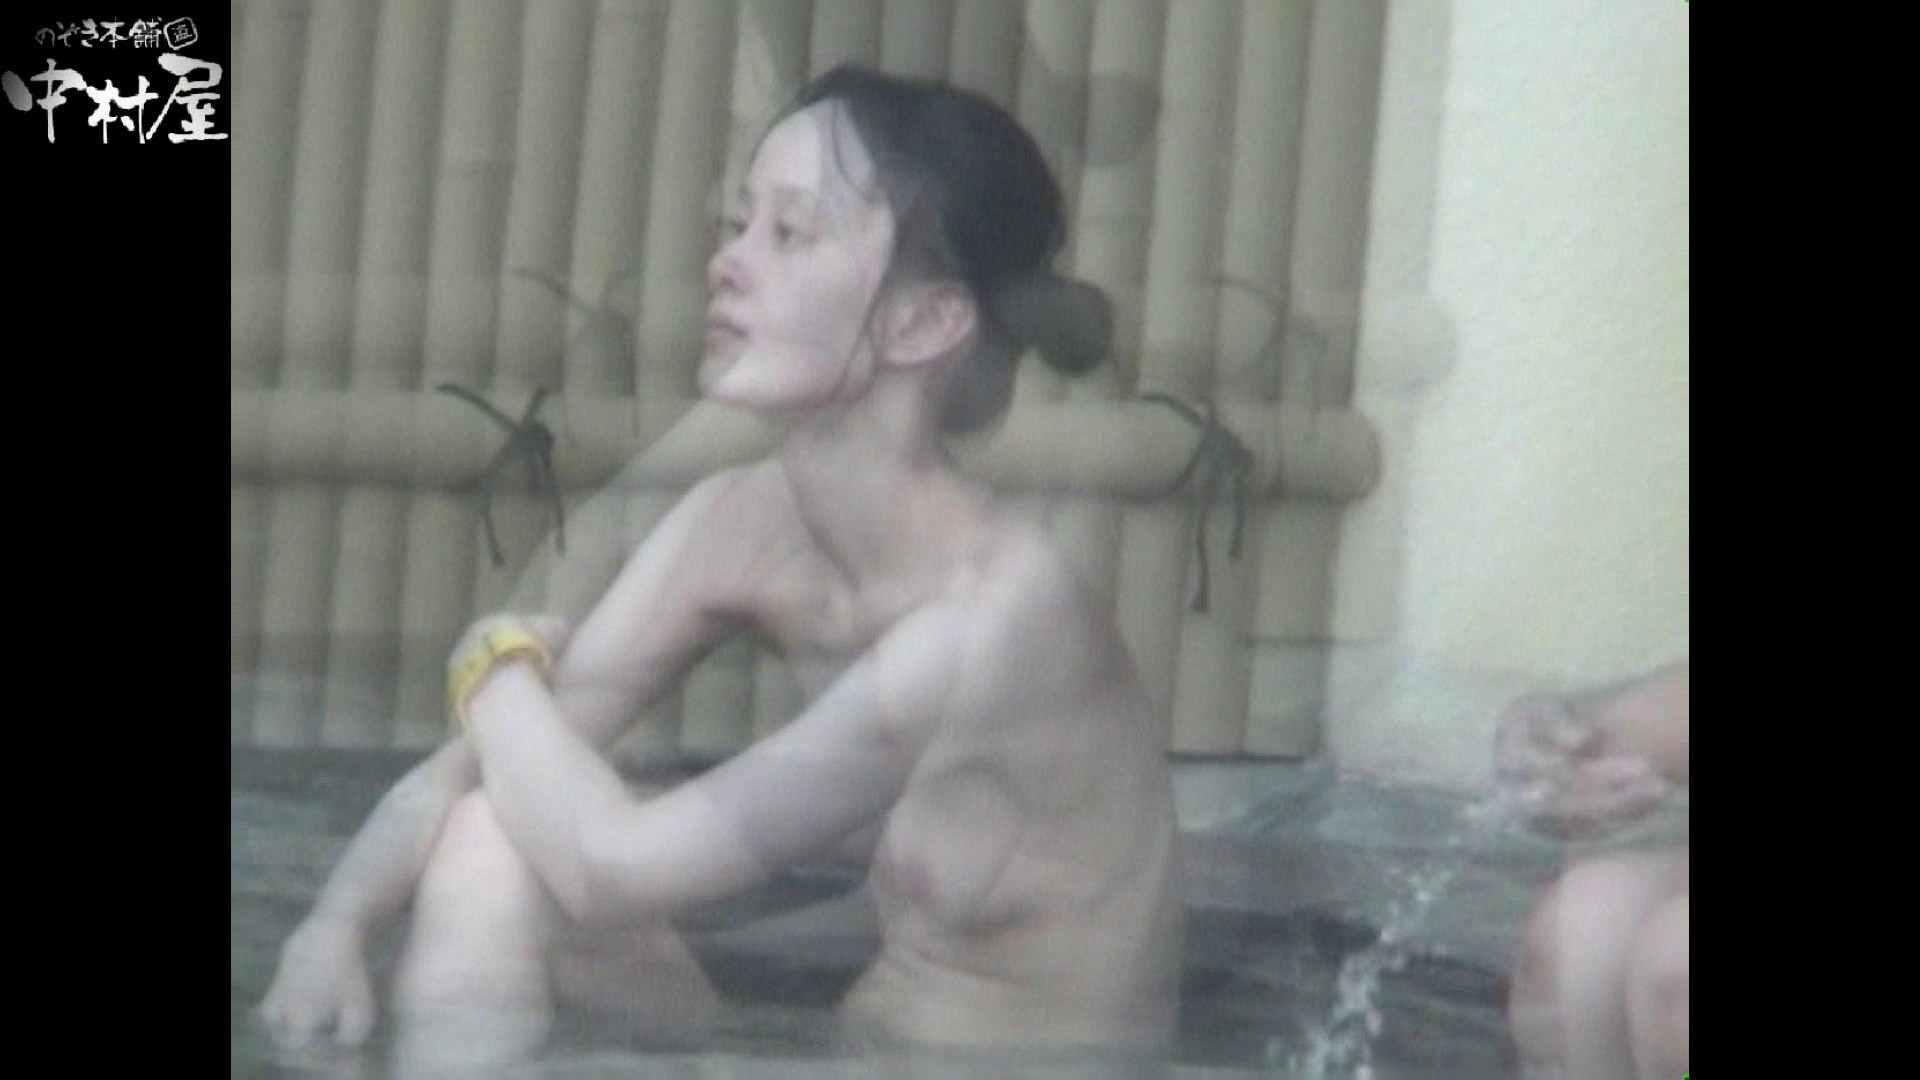 Aquaな露天風呂Vol.973 美しいOLの裸体 性交動画流出 95pic 56